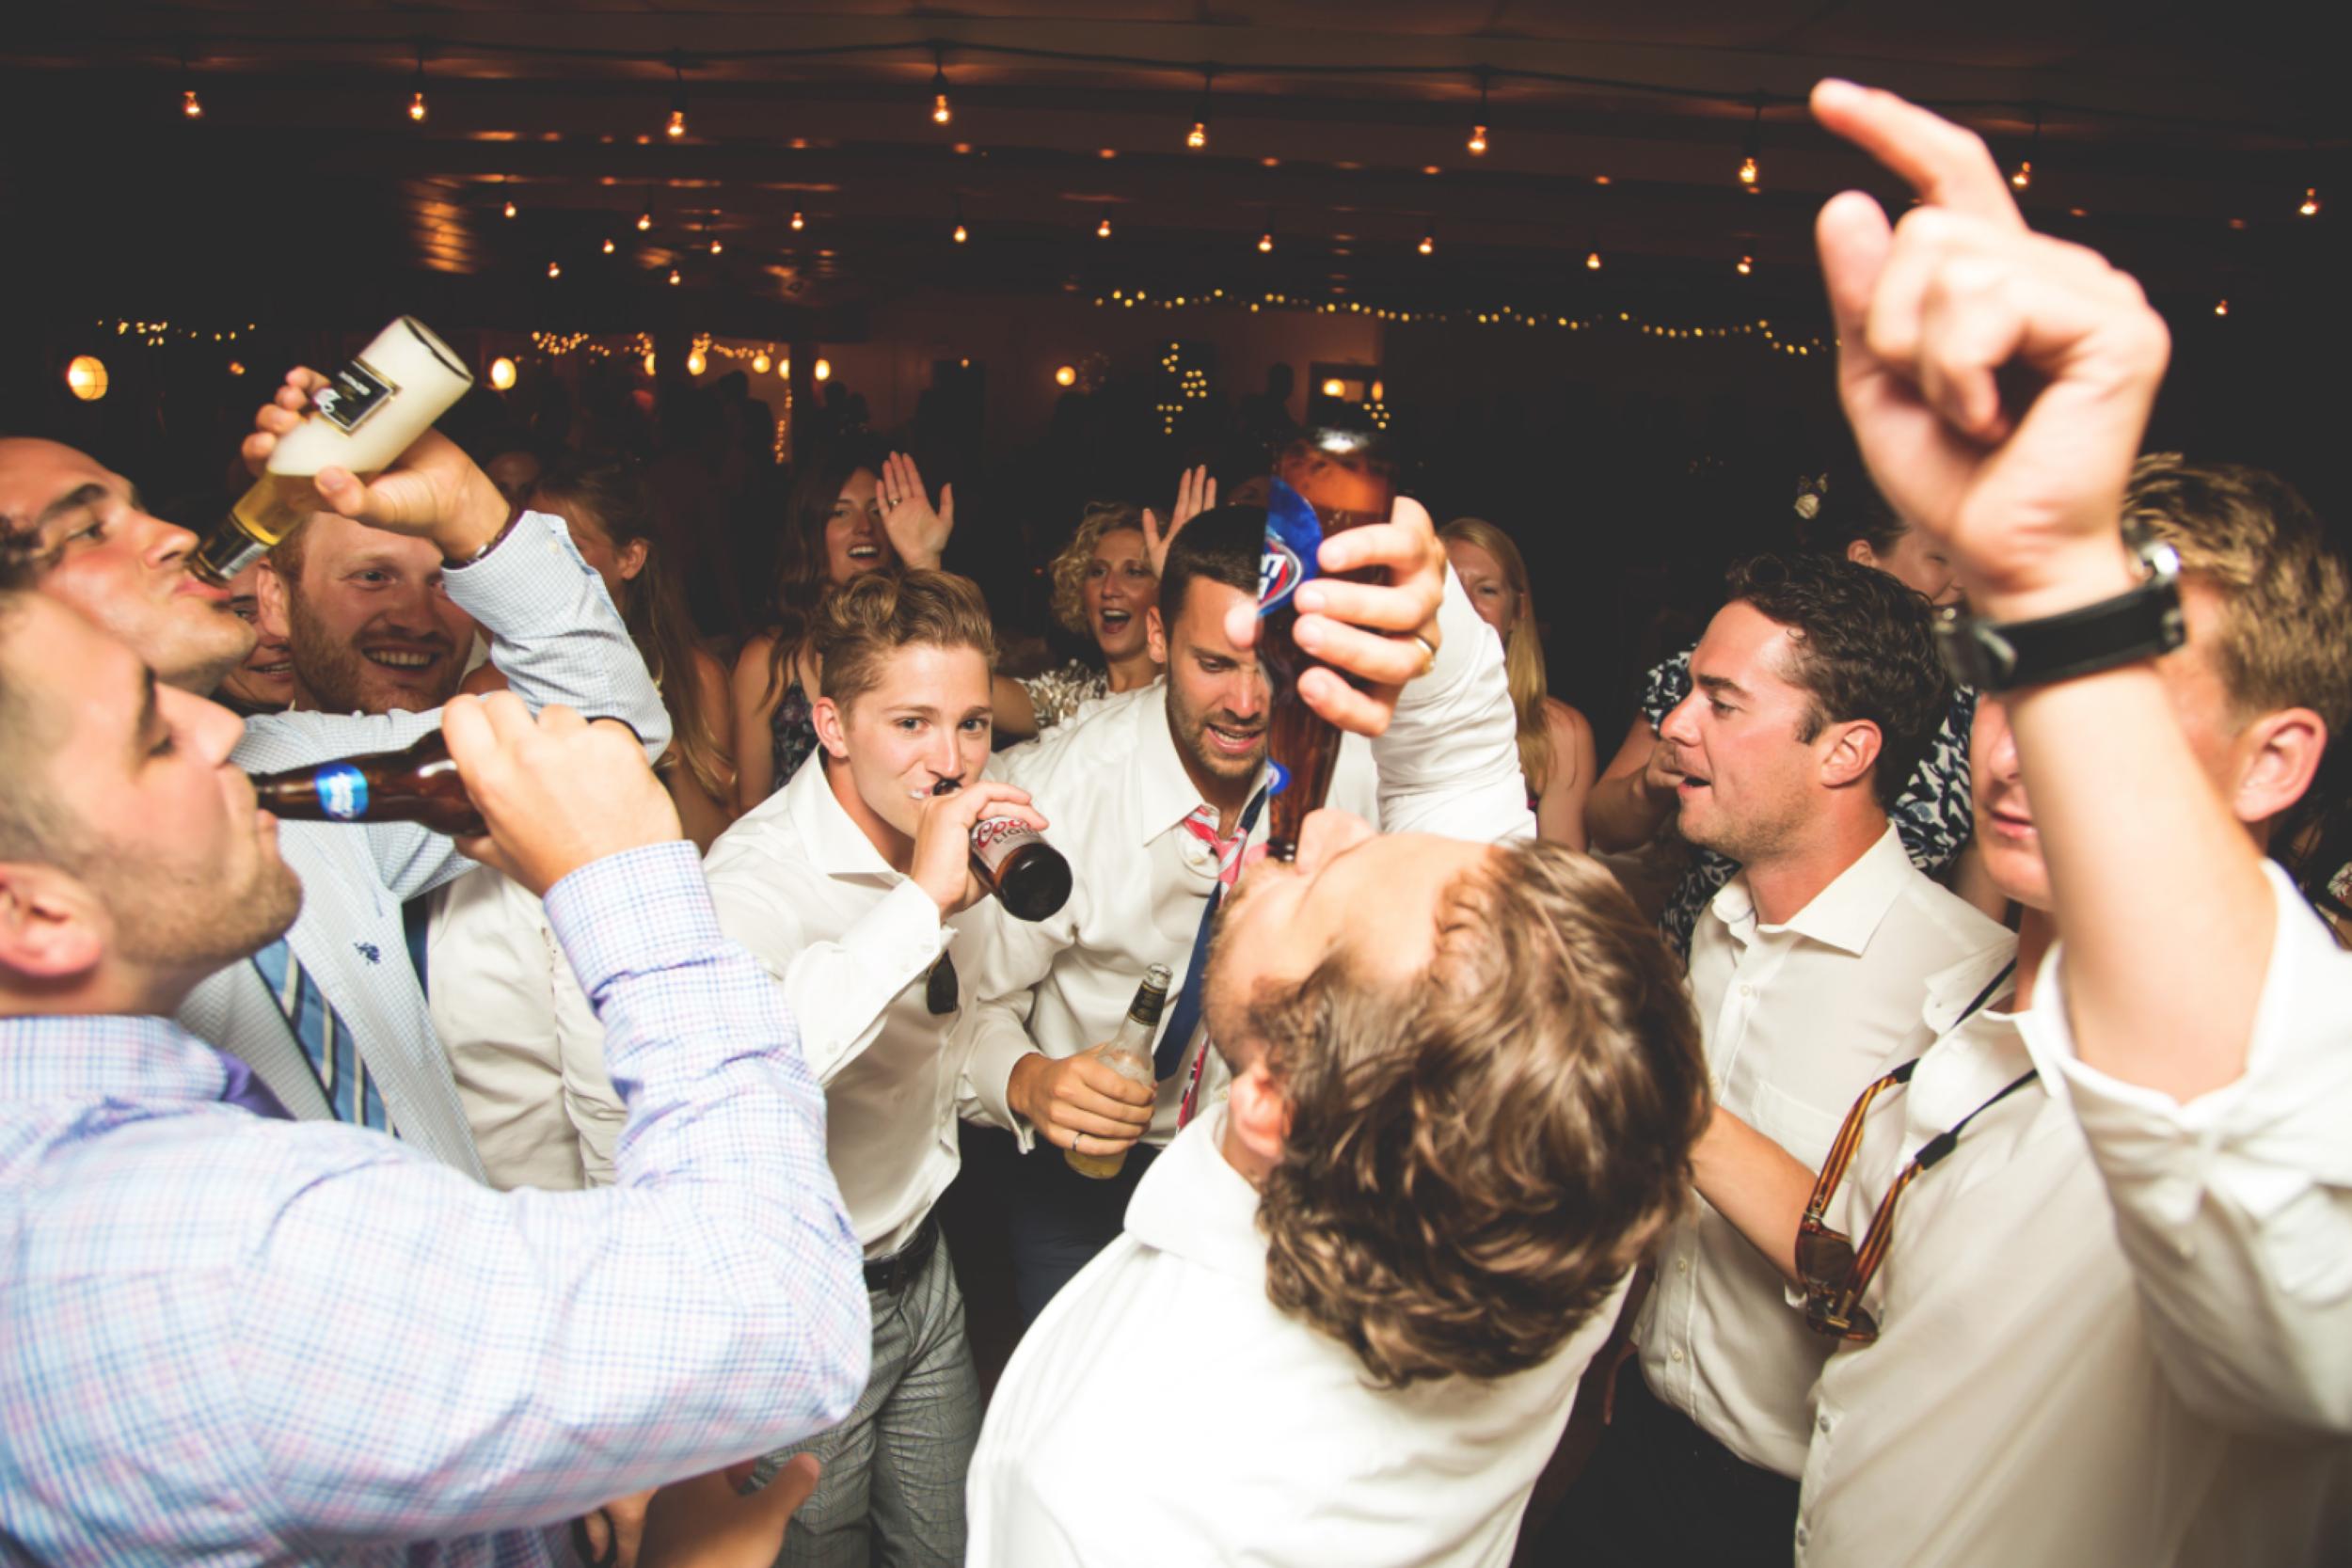 Wedding-Photos-Muskoka-Clevelands-House-Photographer-Wedding-Hamilton-GTA-Niagara-Oakville-Moments-by-Lauren-Photography-Photo-Image-112.png